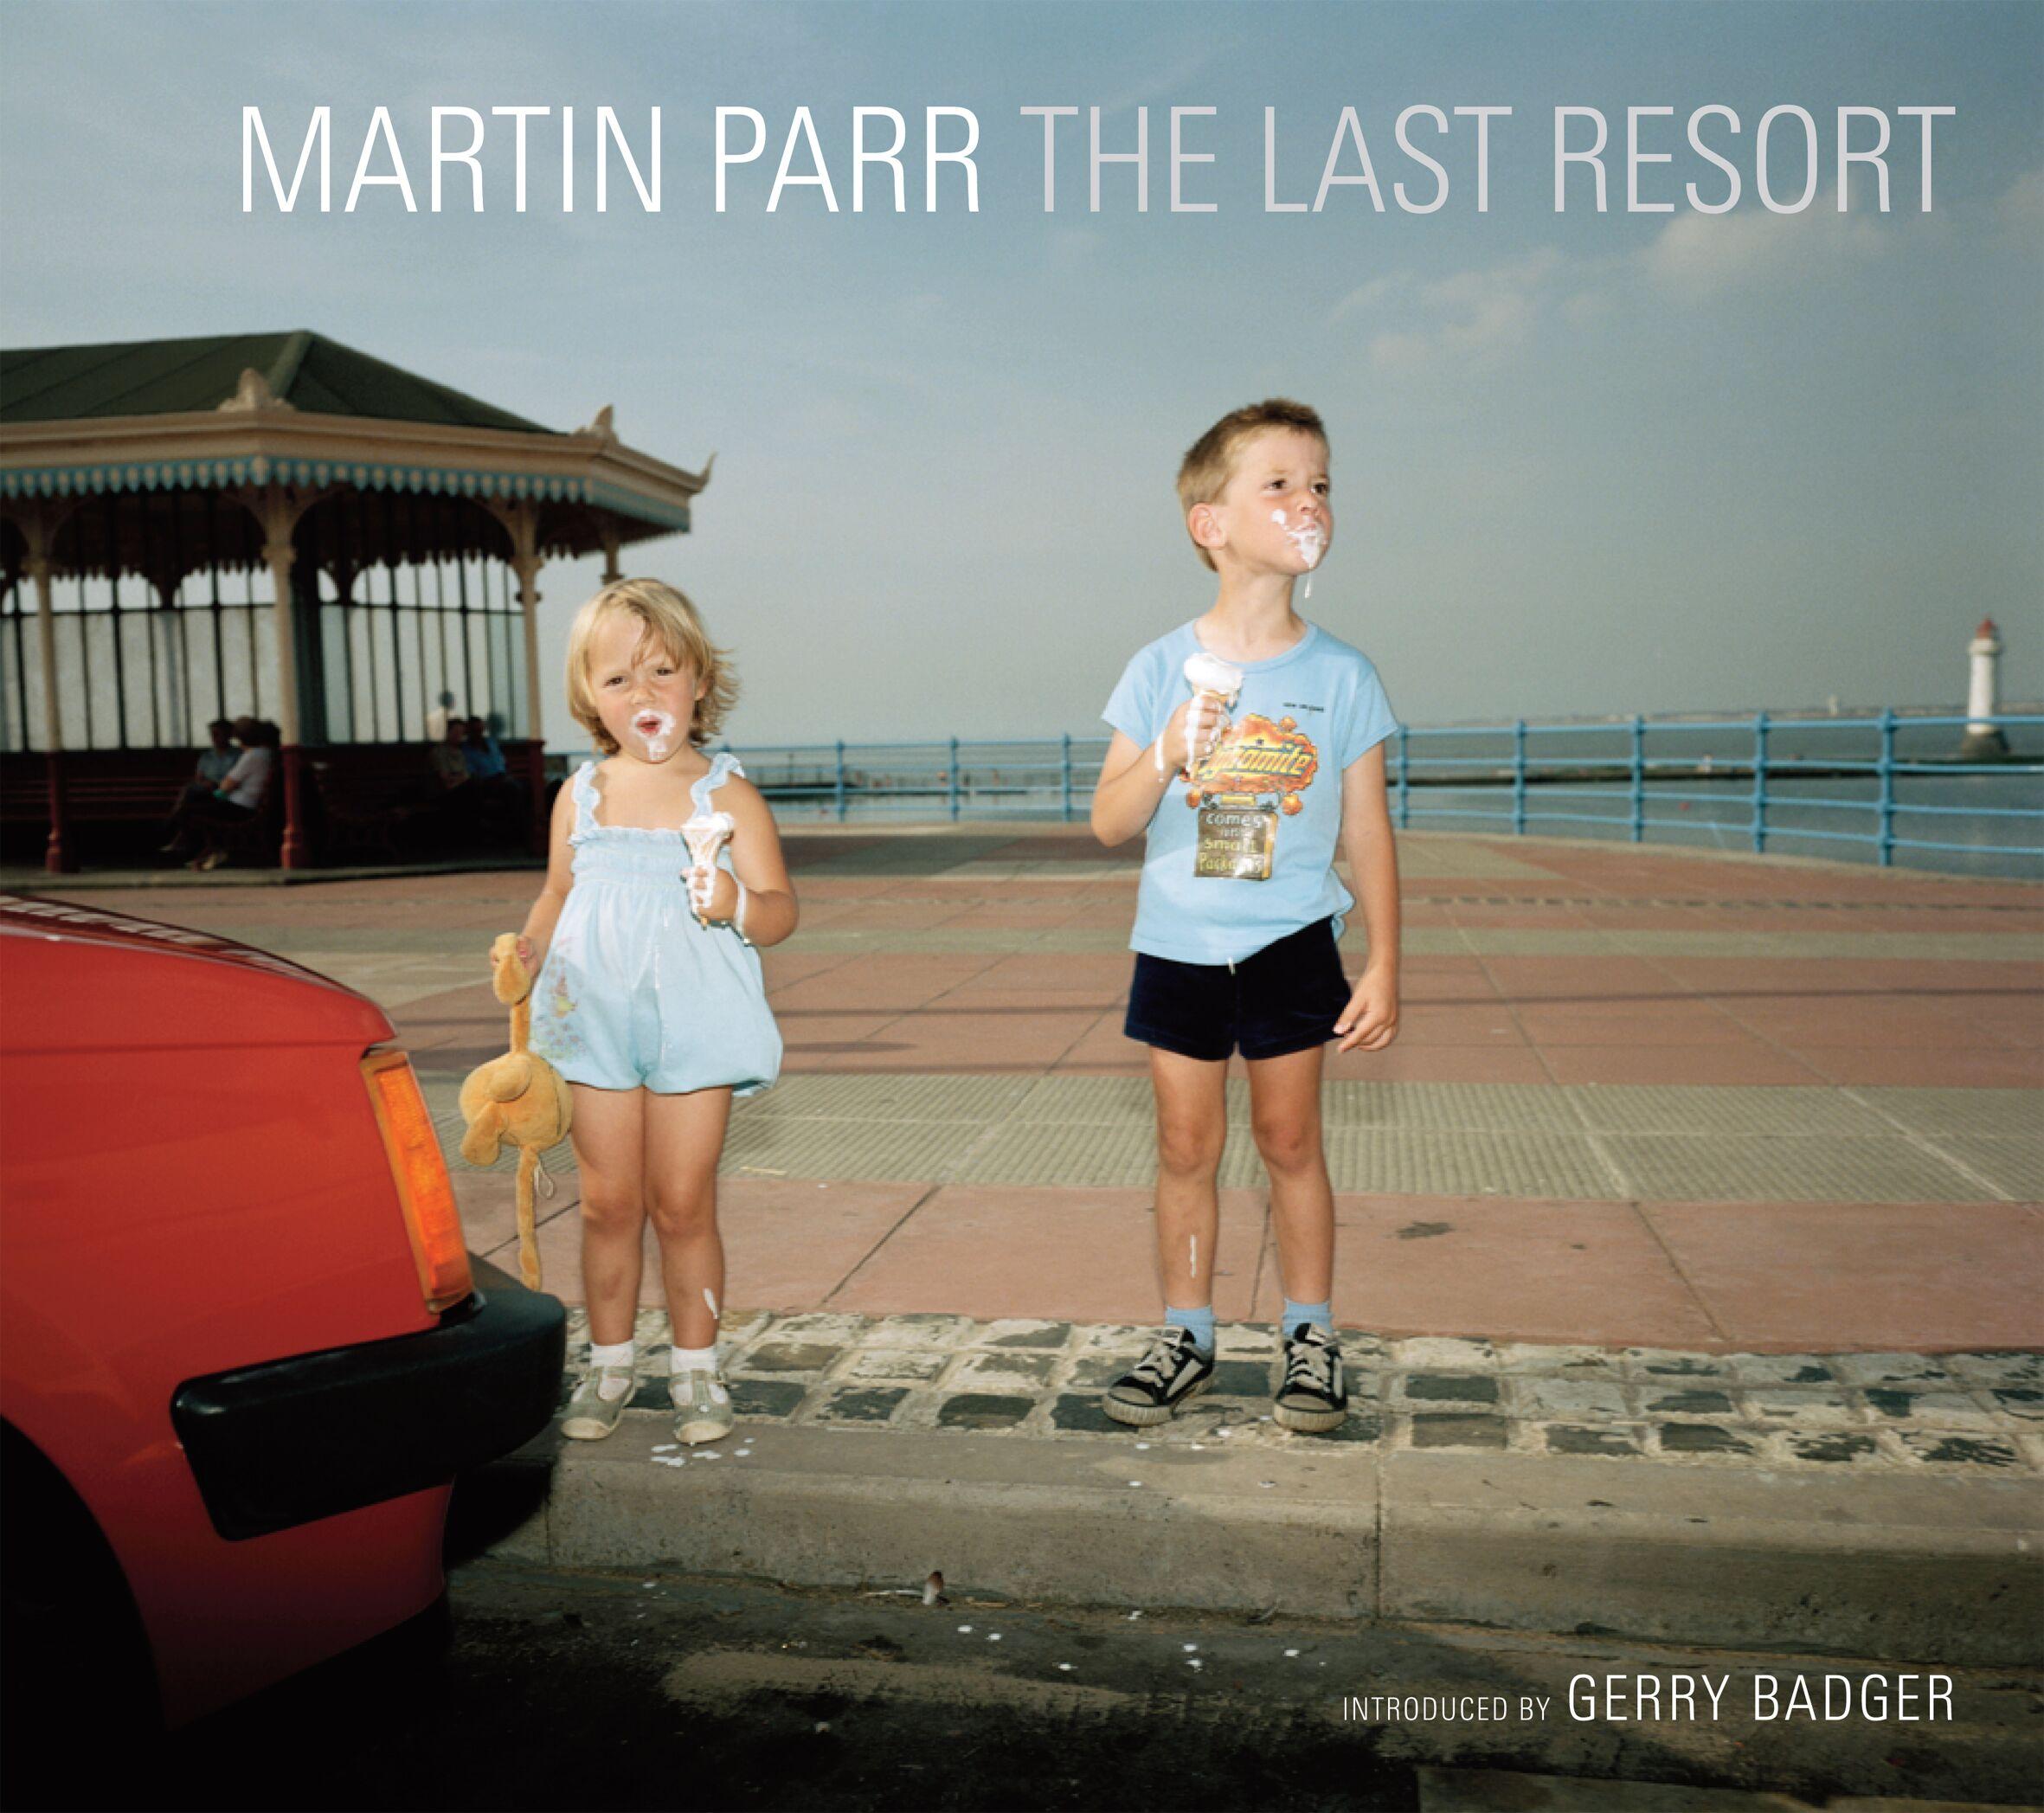 The Last Resort © Martin Parr and Magnum Photos